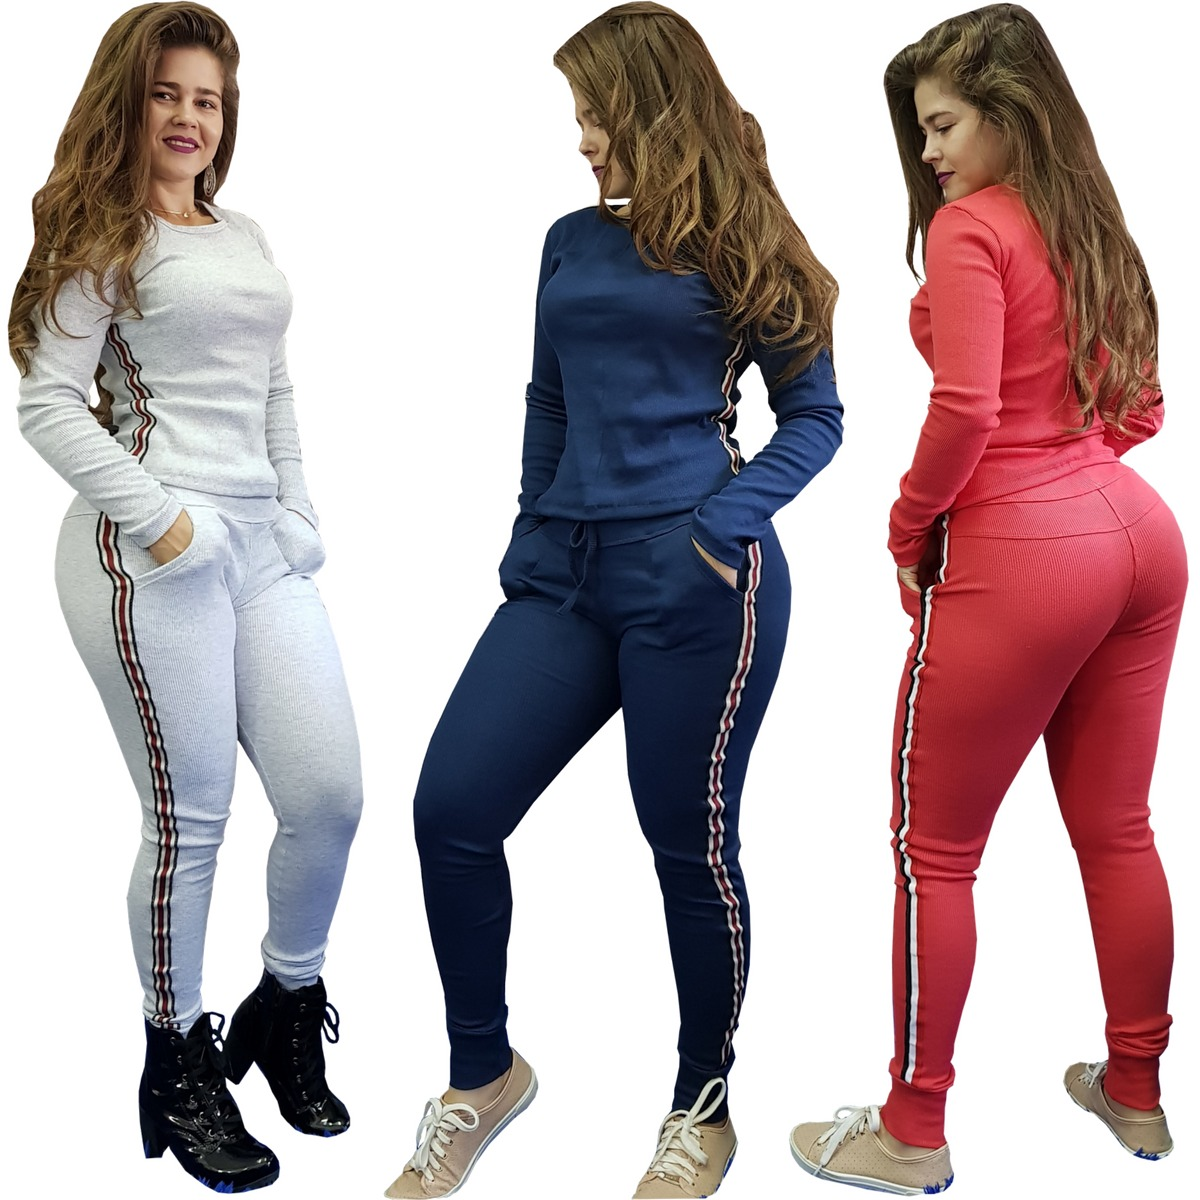 504eaafd107 kit 3 conjunto feminino tipo moletom calça e blusa oferta. Carregando zoom.